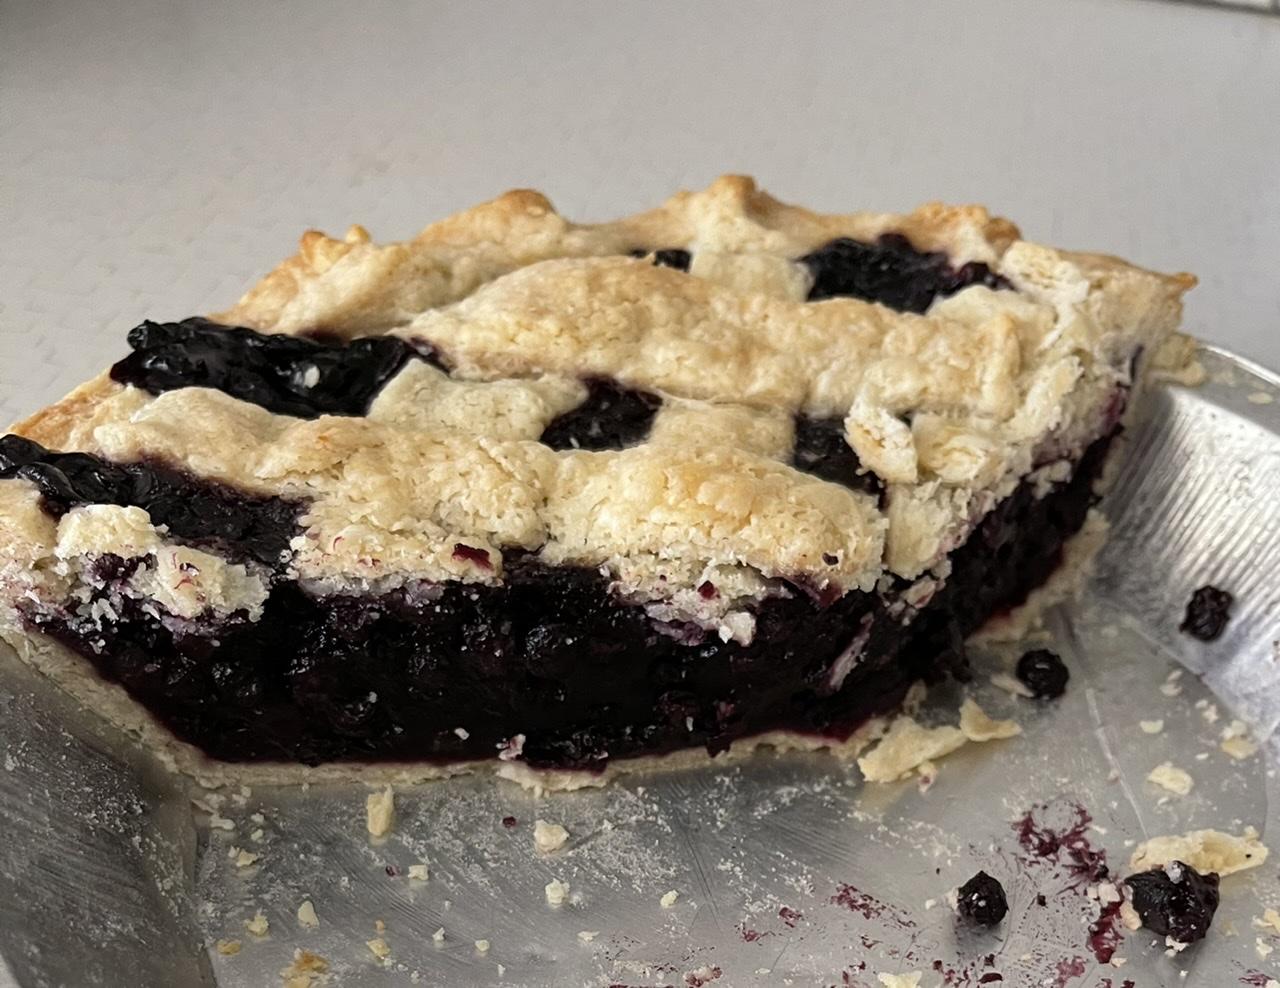 Blueberry Pie with Frozen Berries